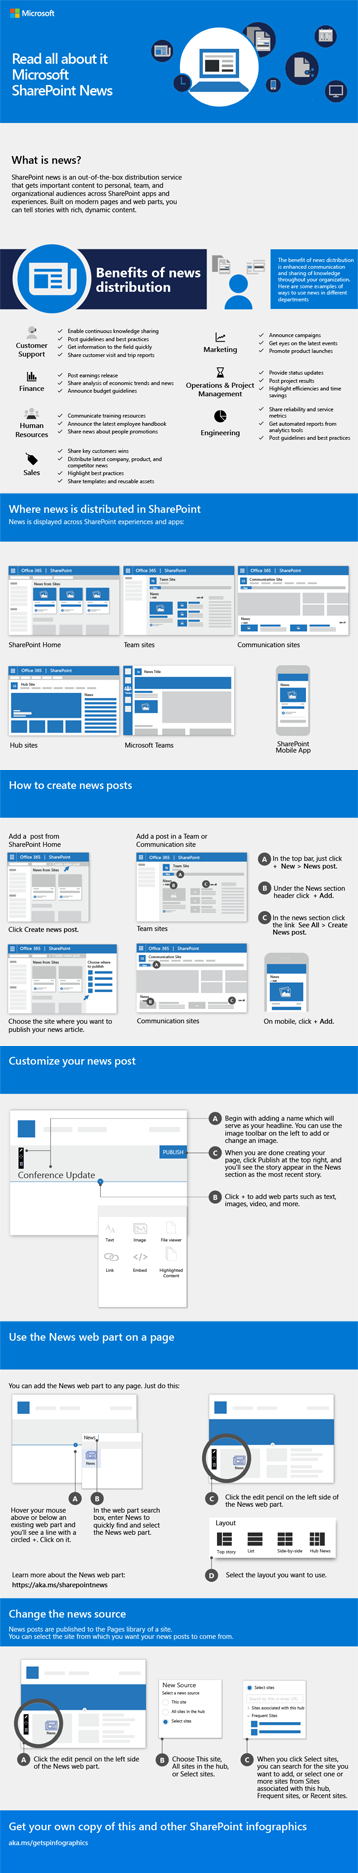 SharePoint-hírek – infografika